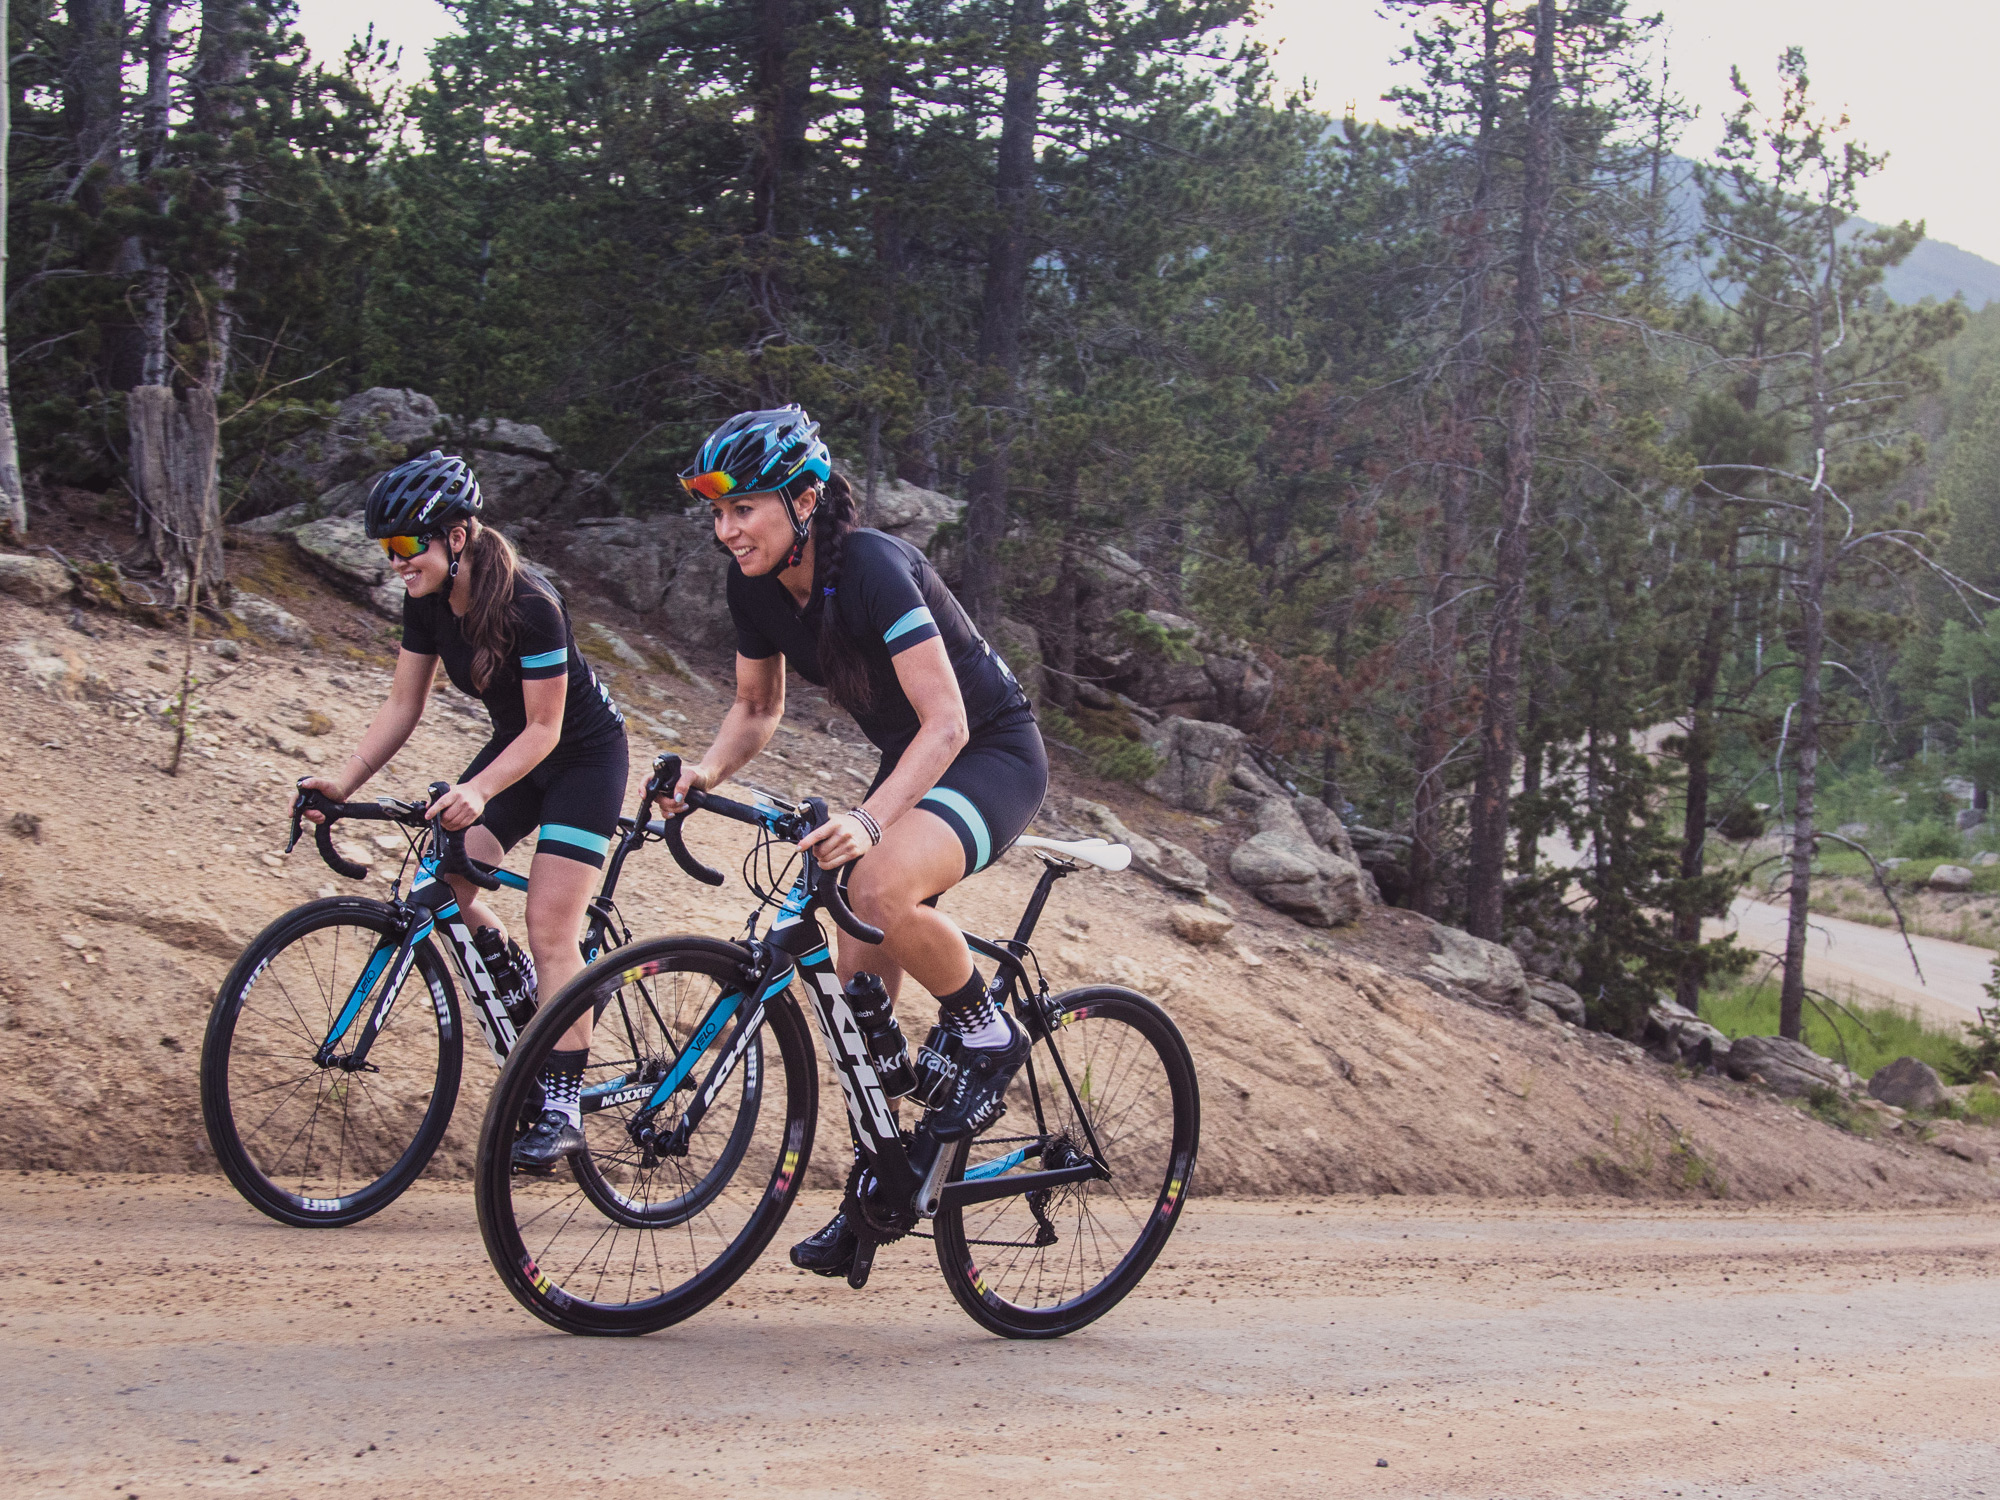 khs-bicycles-masthead-2000x1500-team-grit-trail